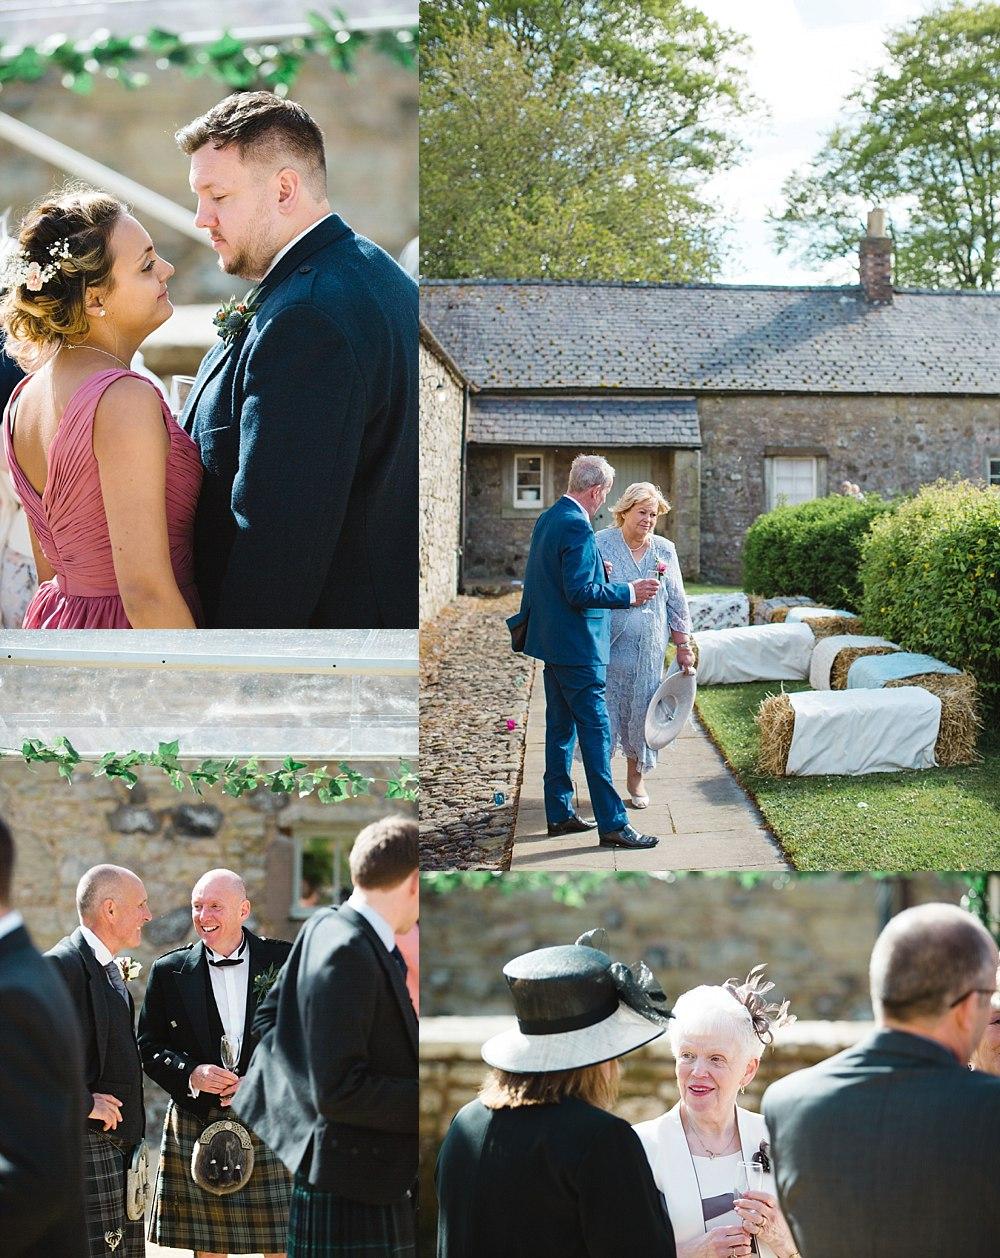 wedding wedderburn barns highlights 10-4.jpg